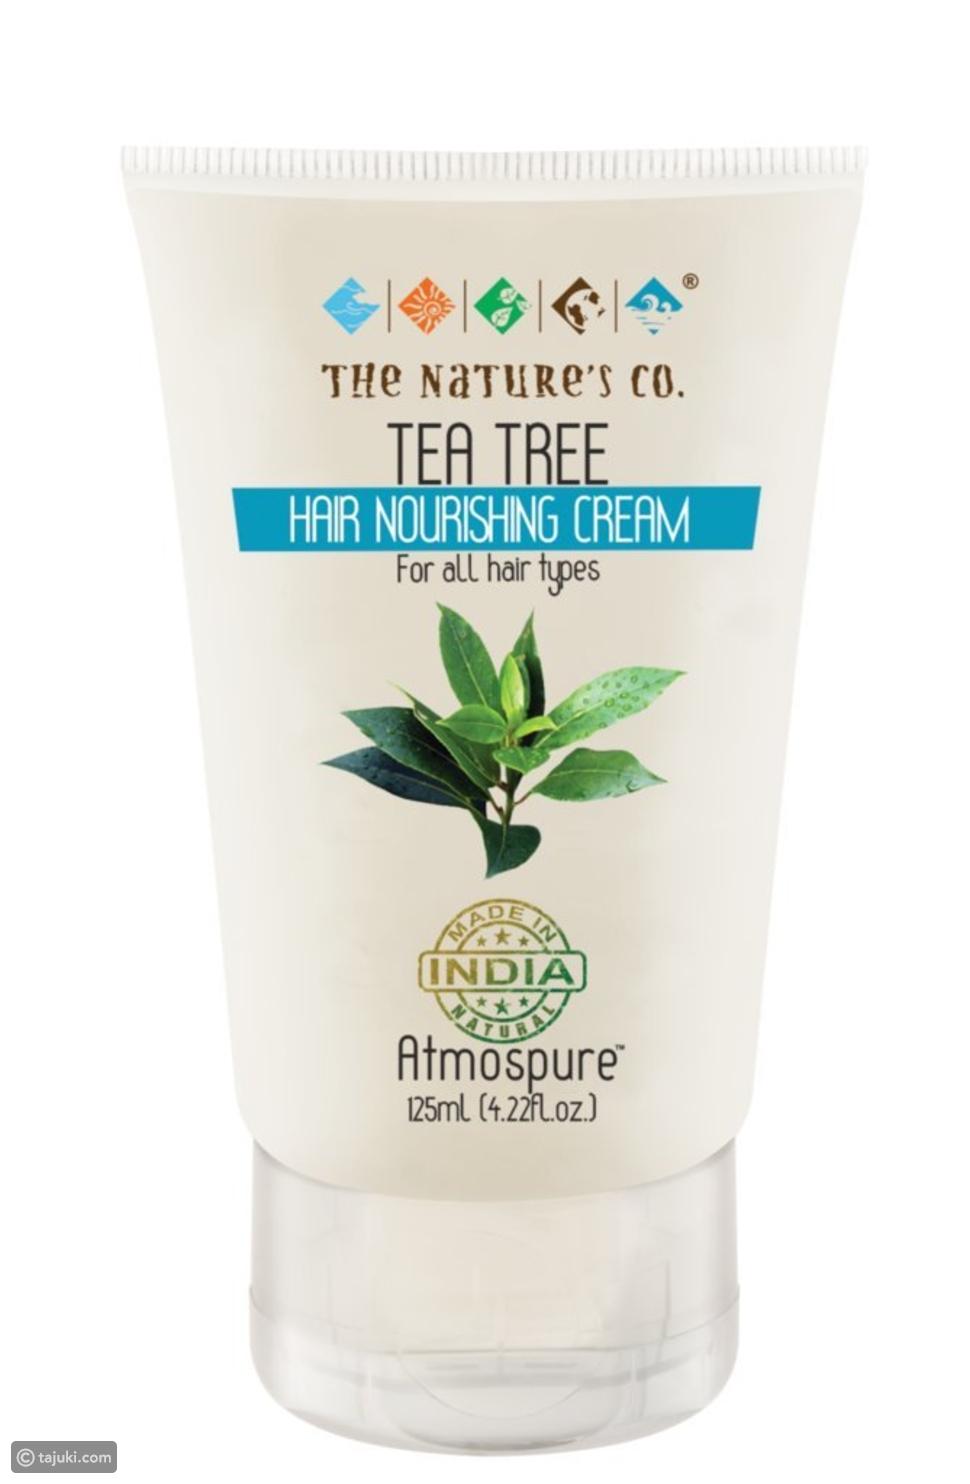 كريم الشعر المغذي بخلاصة شجرة الشاي من ذا ناتشور (The Nature's Co Tea Tree Hair Nourishing Cream):